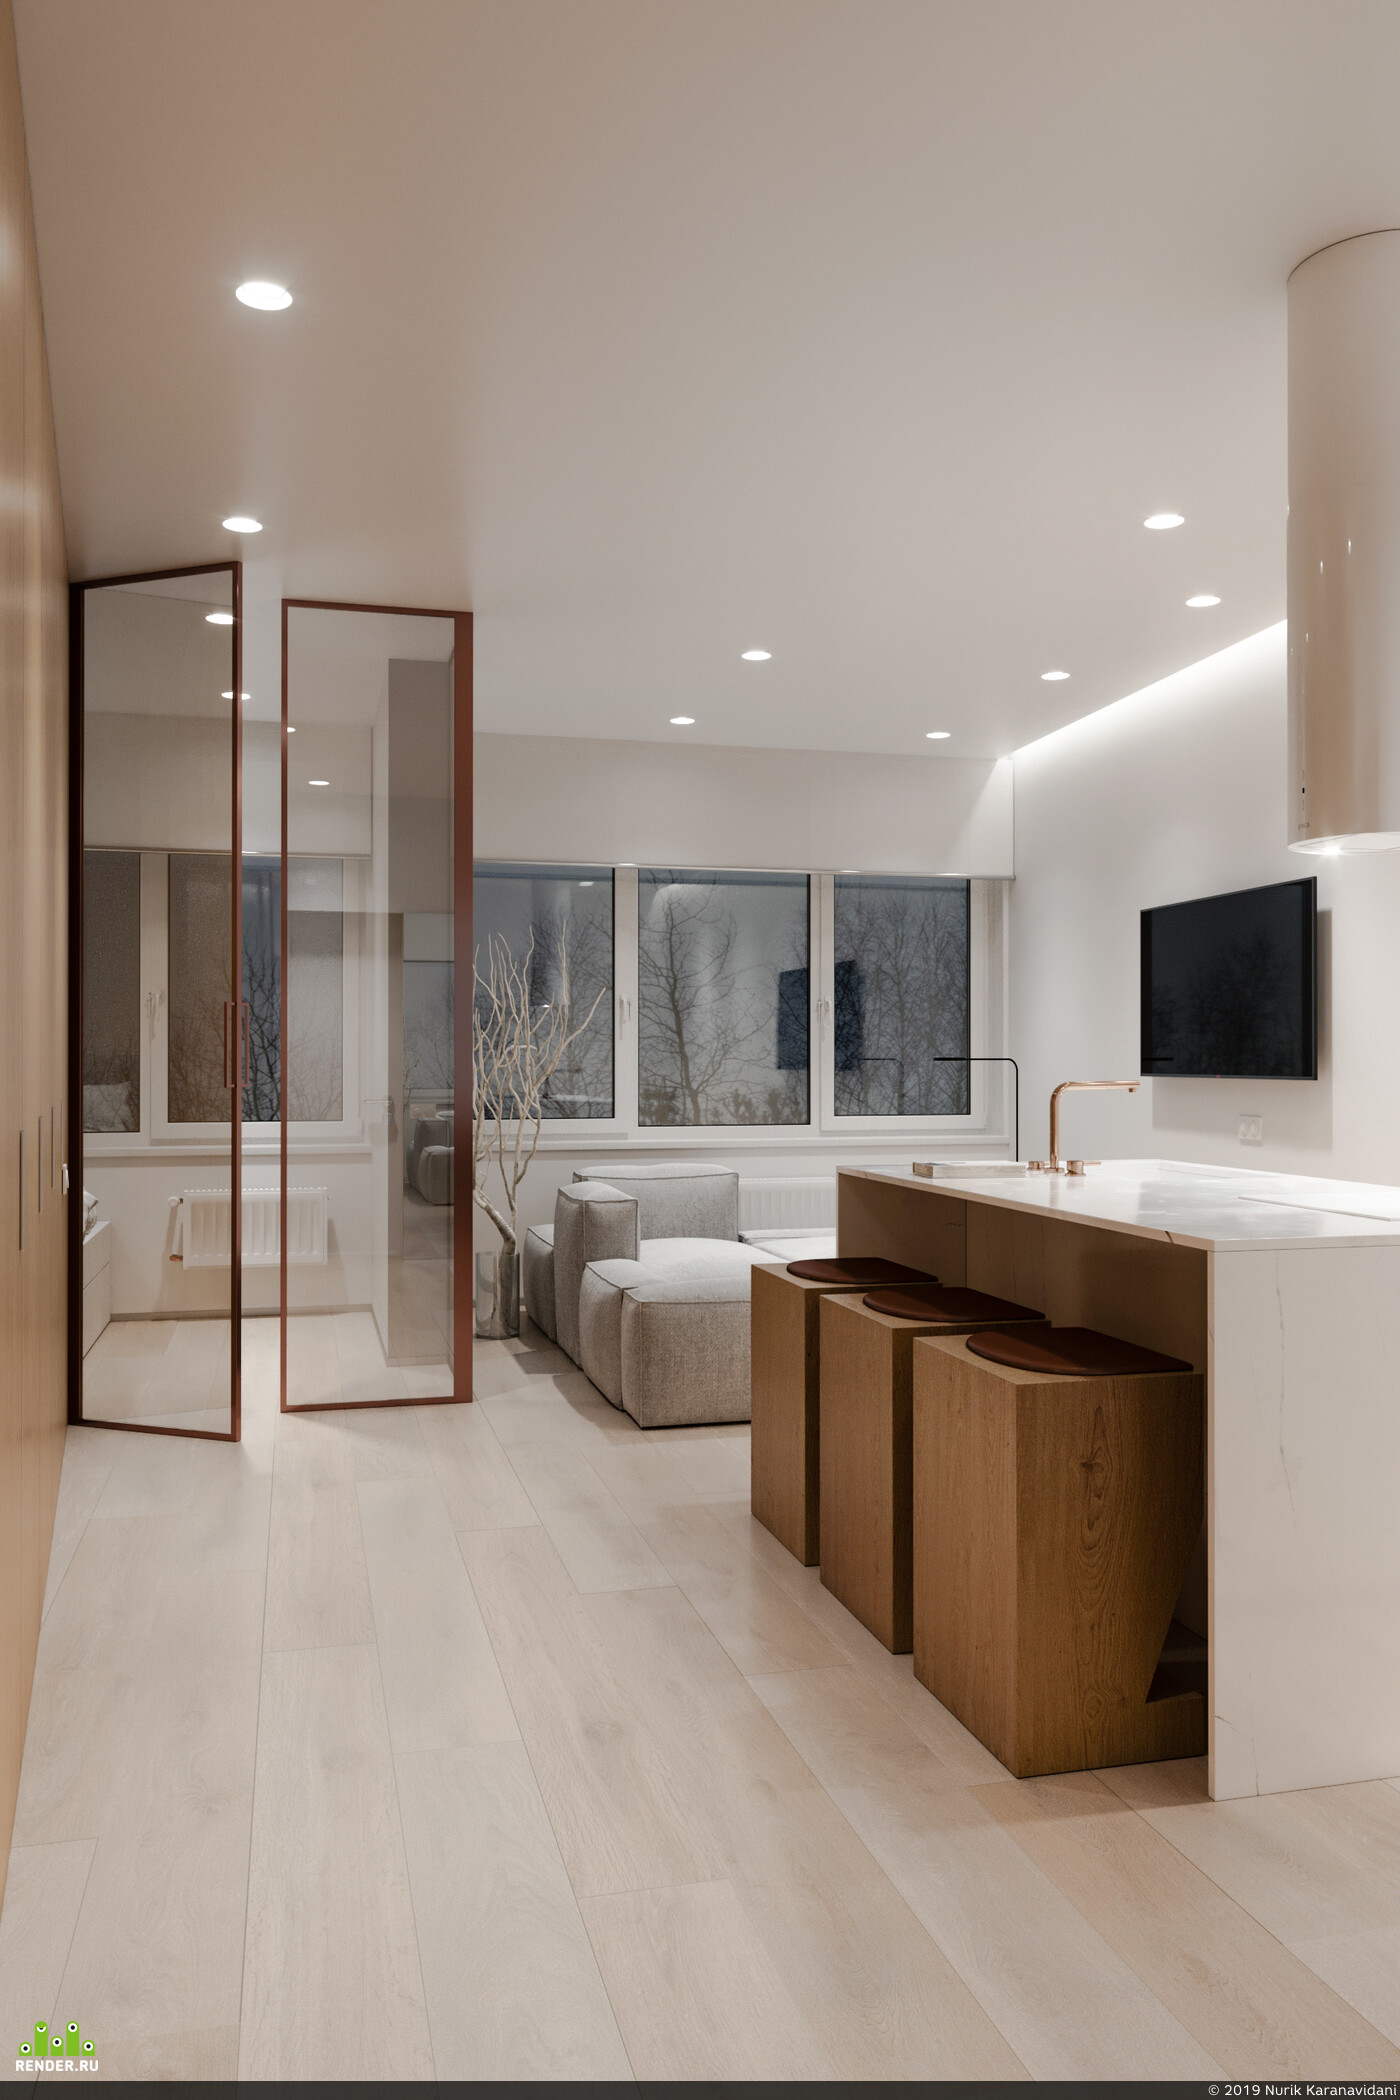 3ds max, 3Dsmax, Corona Renderer, interior, interior design, rendering, cg art, Компьютерная графика/CG, fullcgi